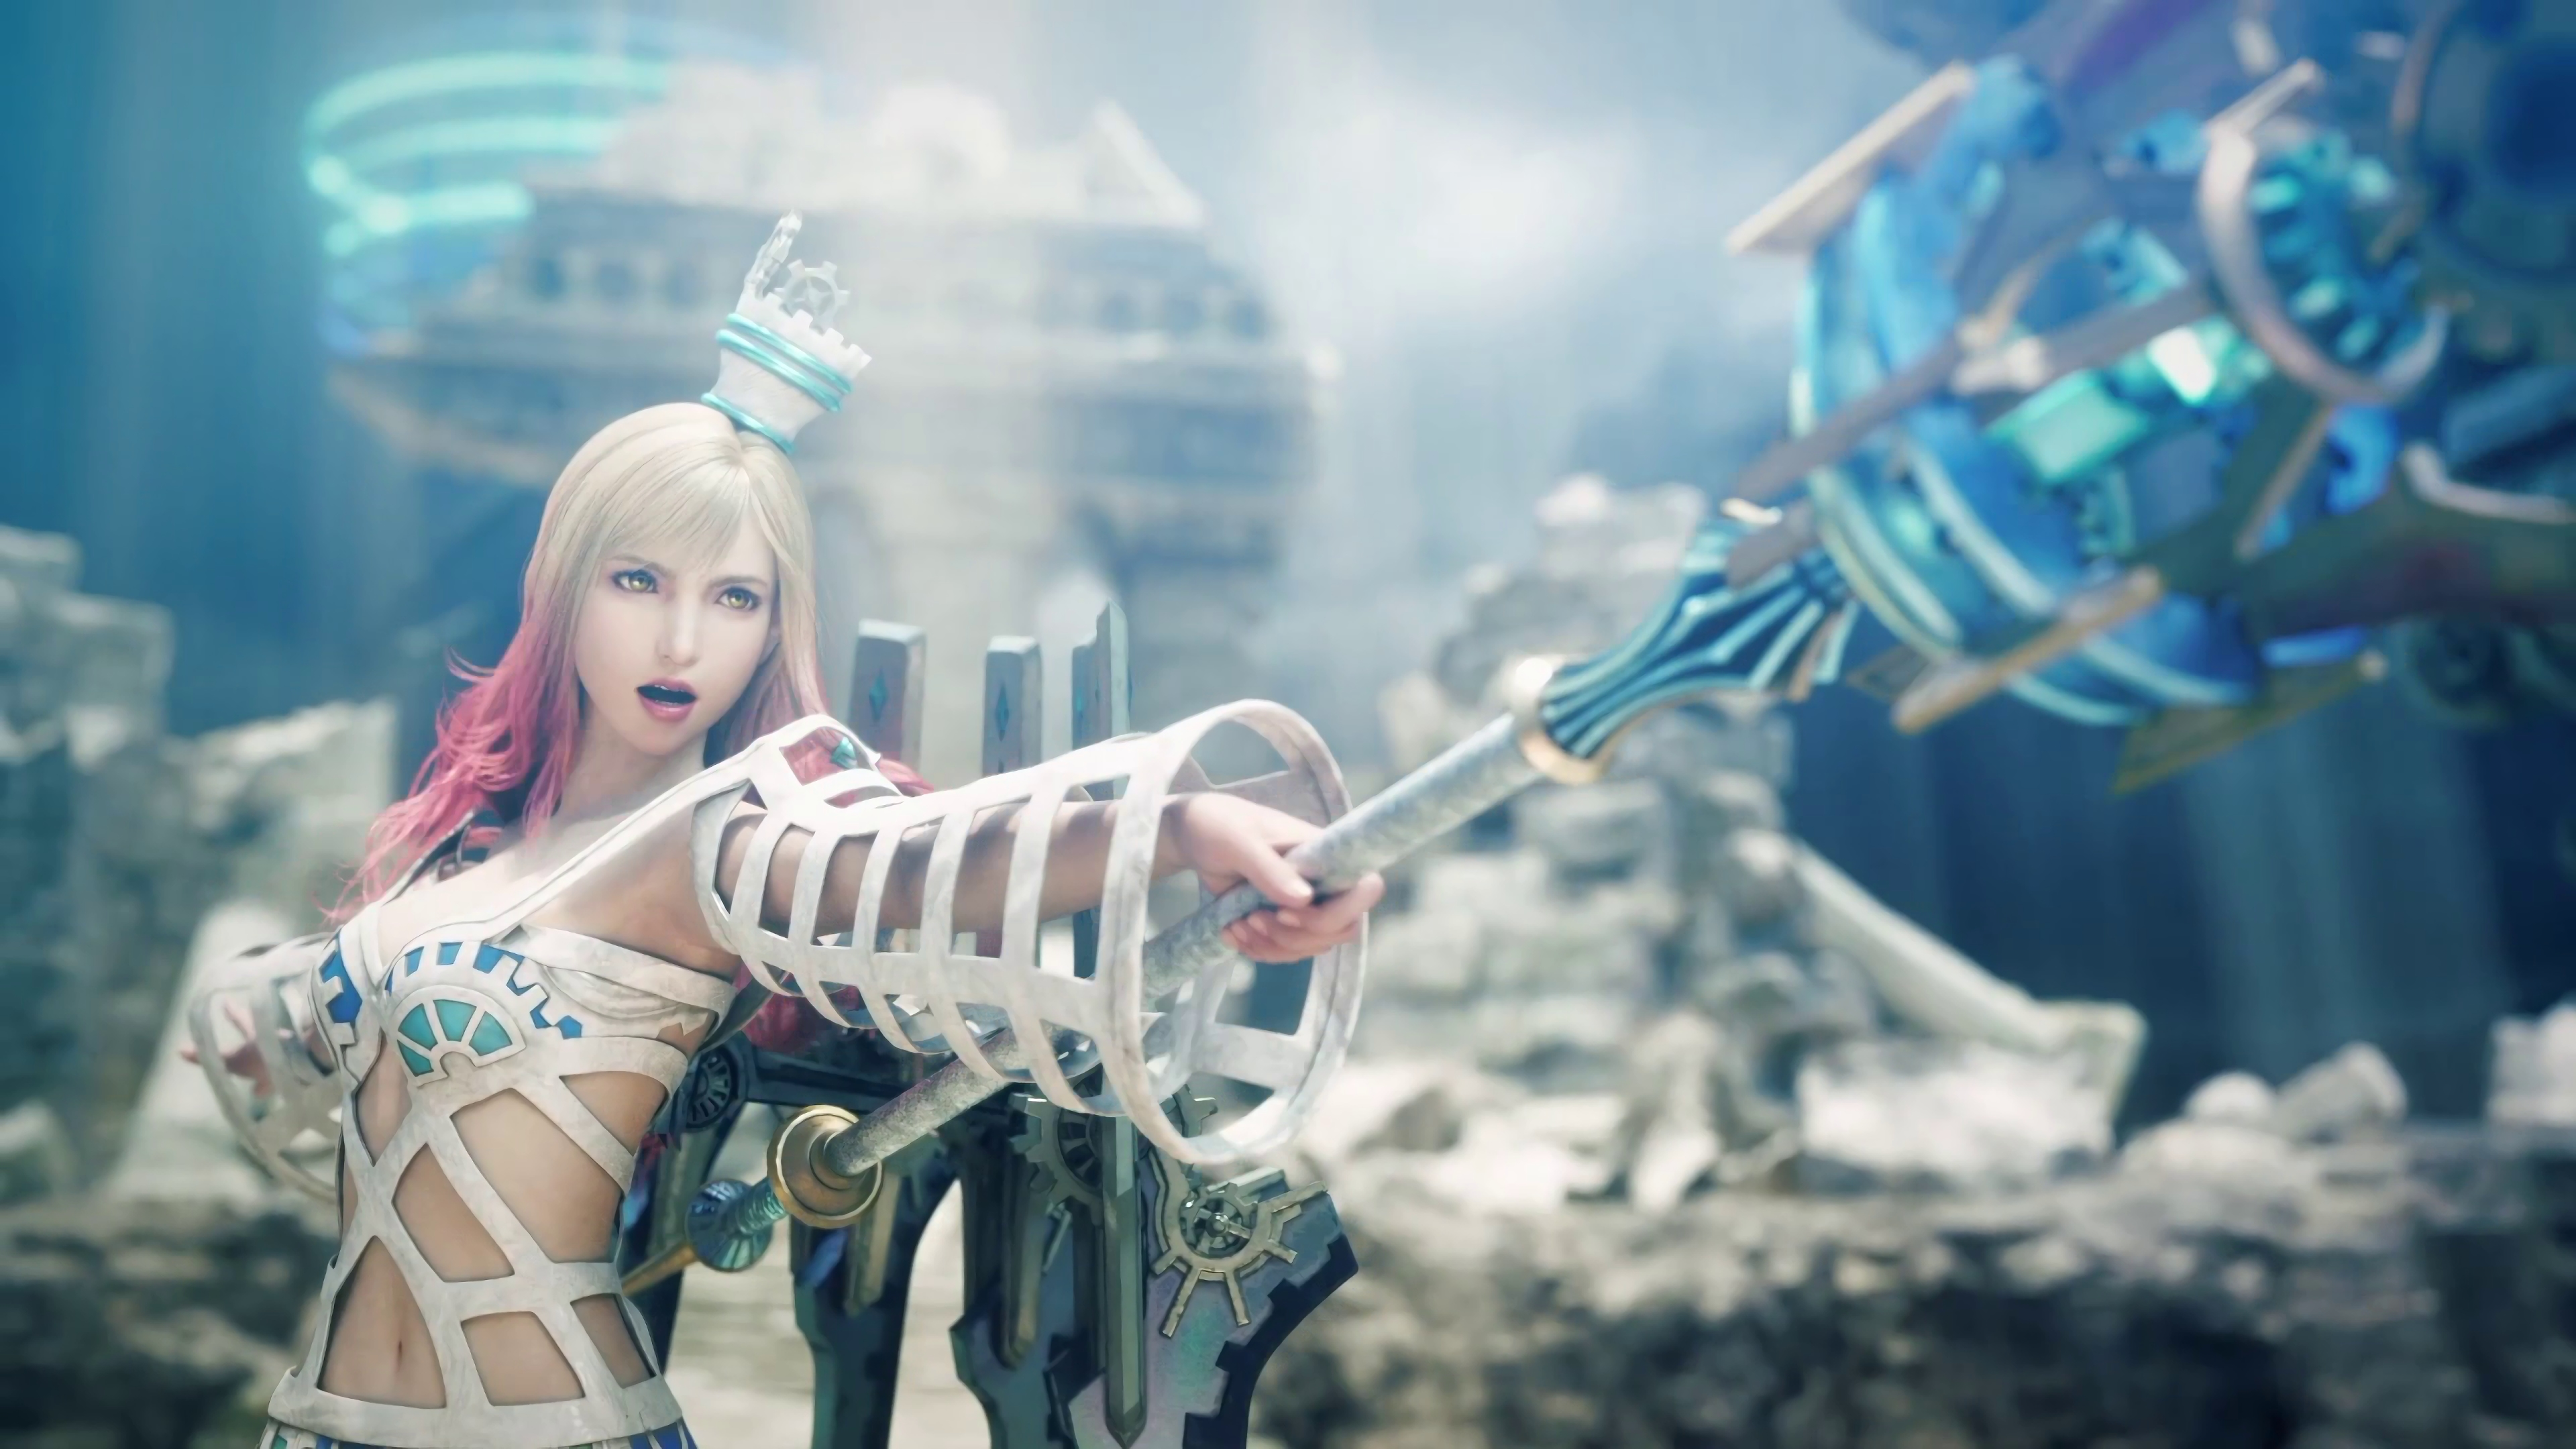 Final Fantasy 4k Hd Games 4k Wallpapers Images: Dissidia Final Fantasy NT 4k Game, HD Games, 4k Wallpapers